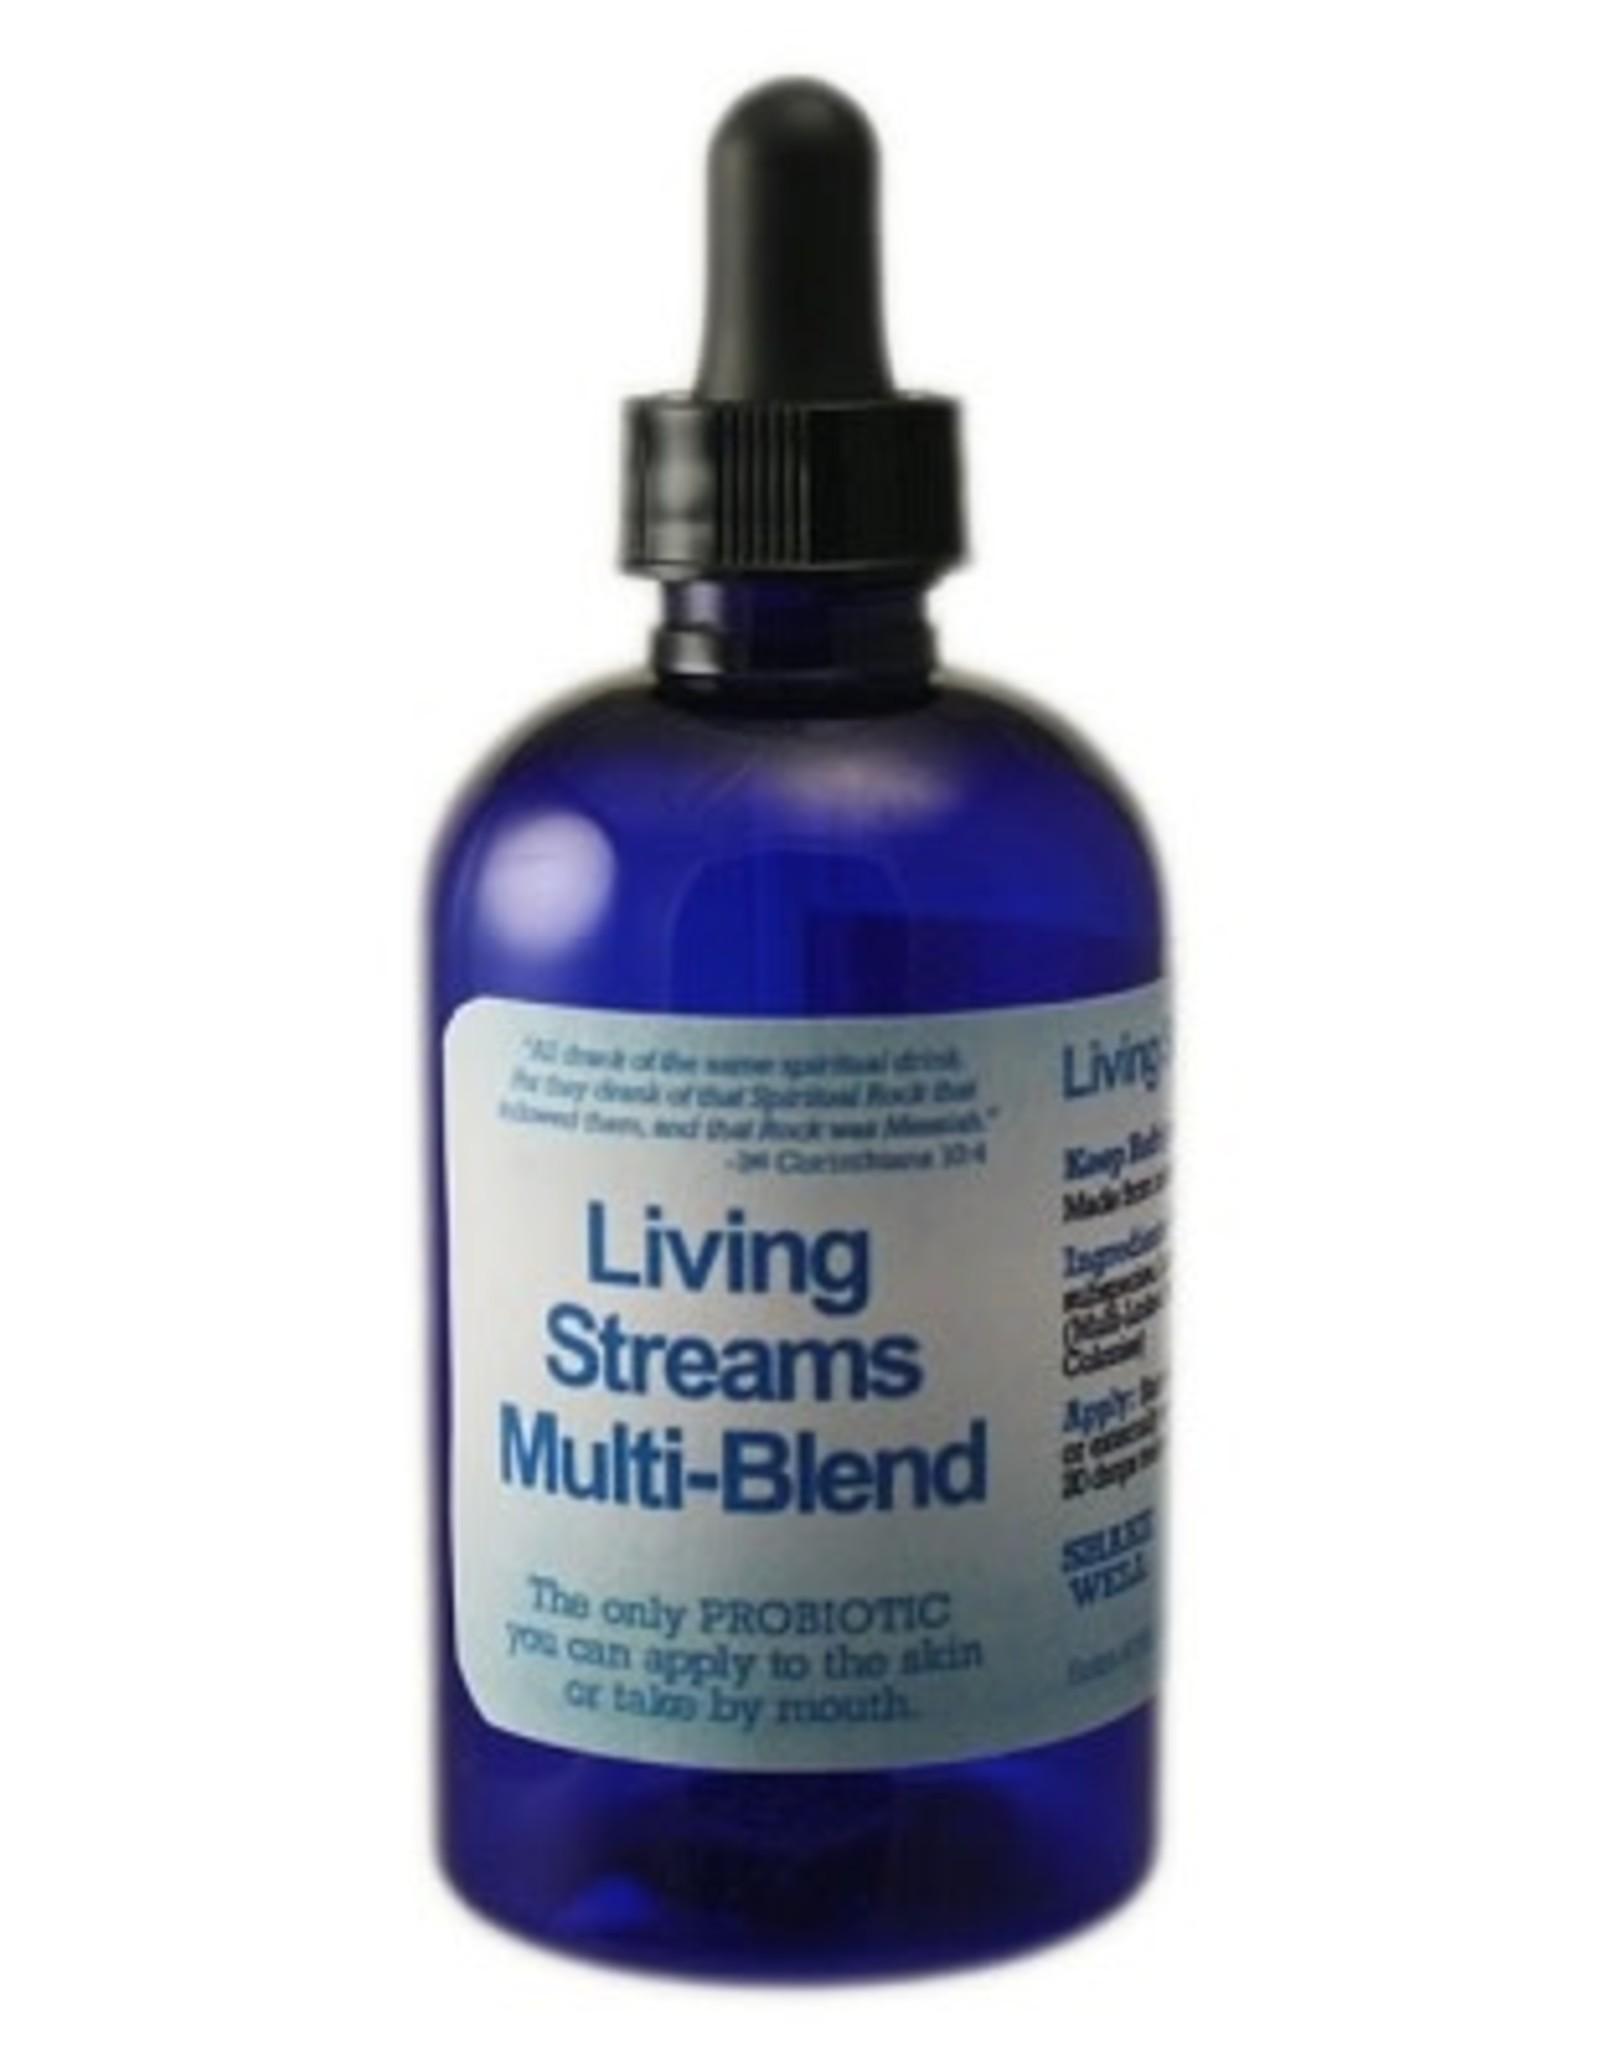 Living Streams Multi-Blend